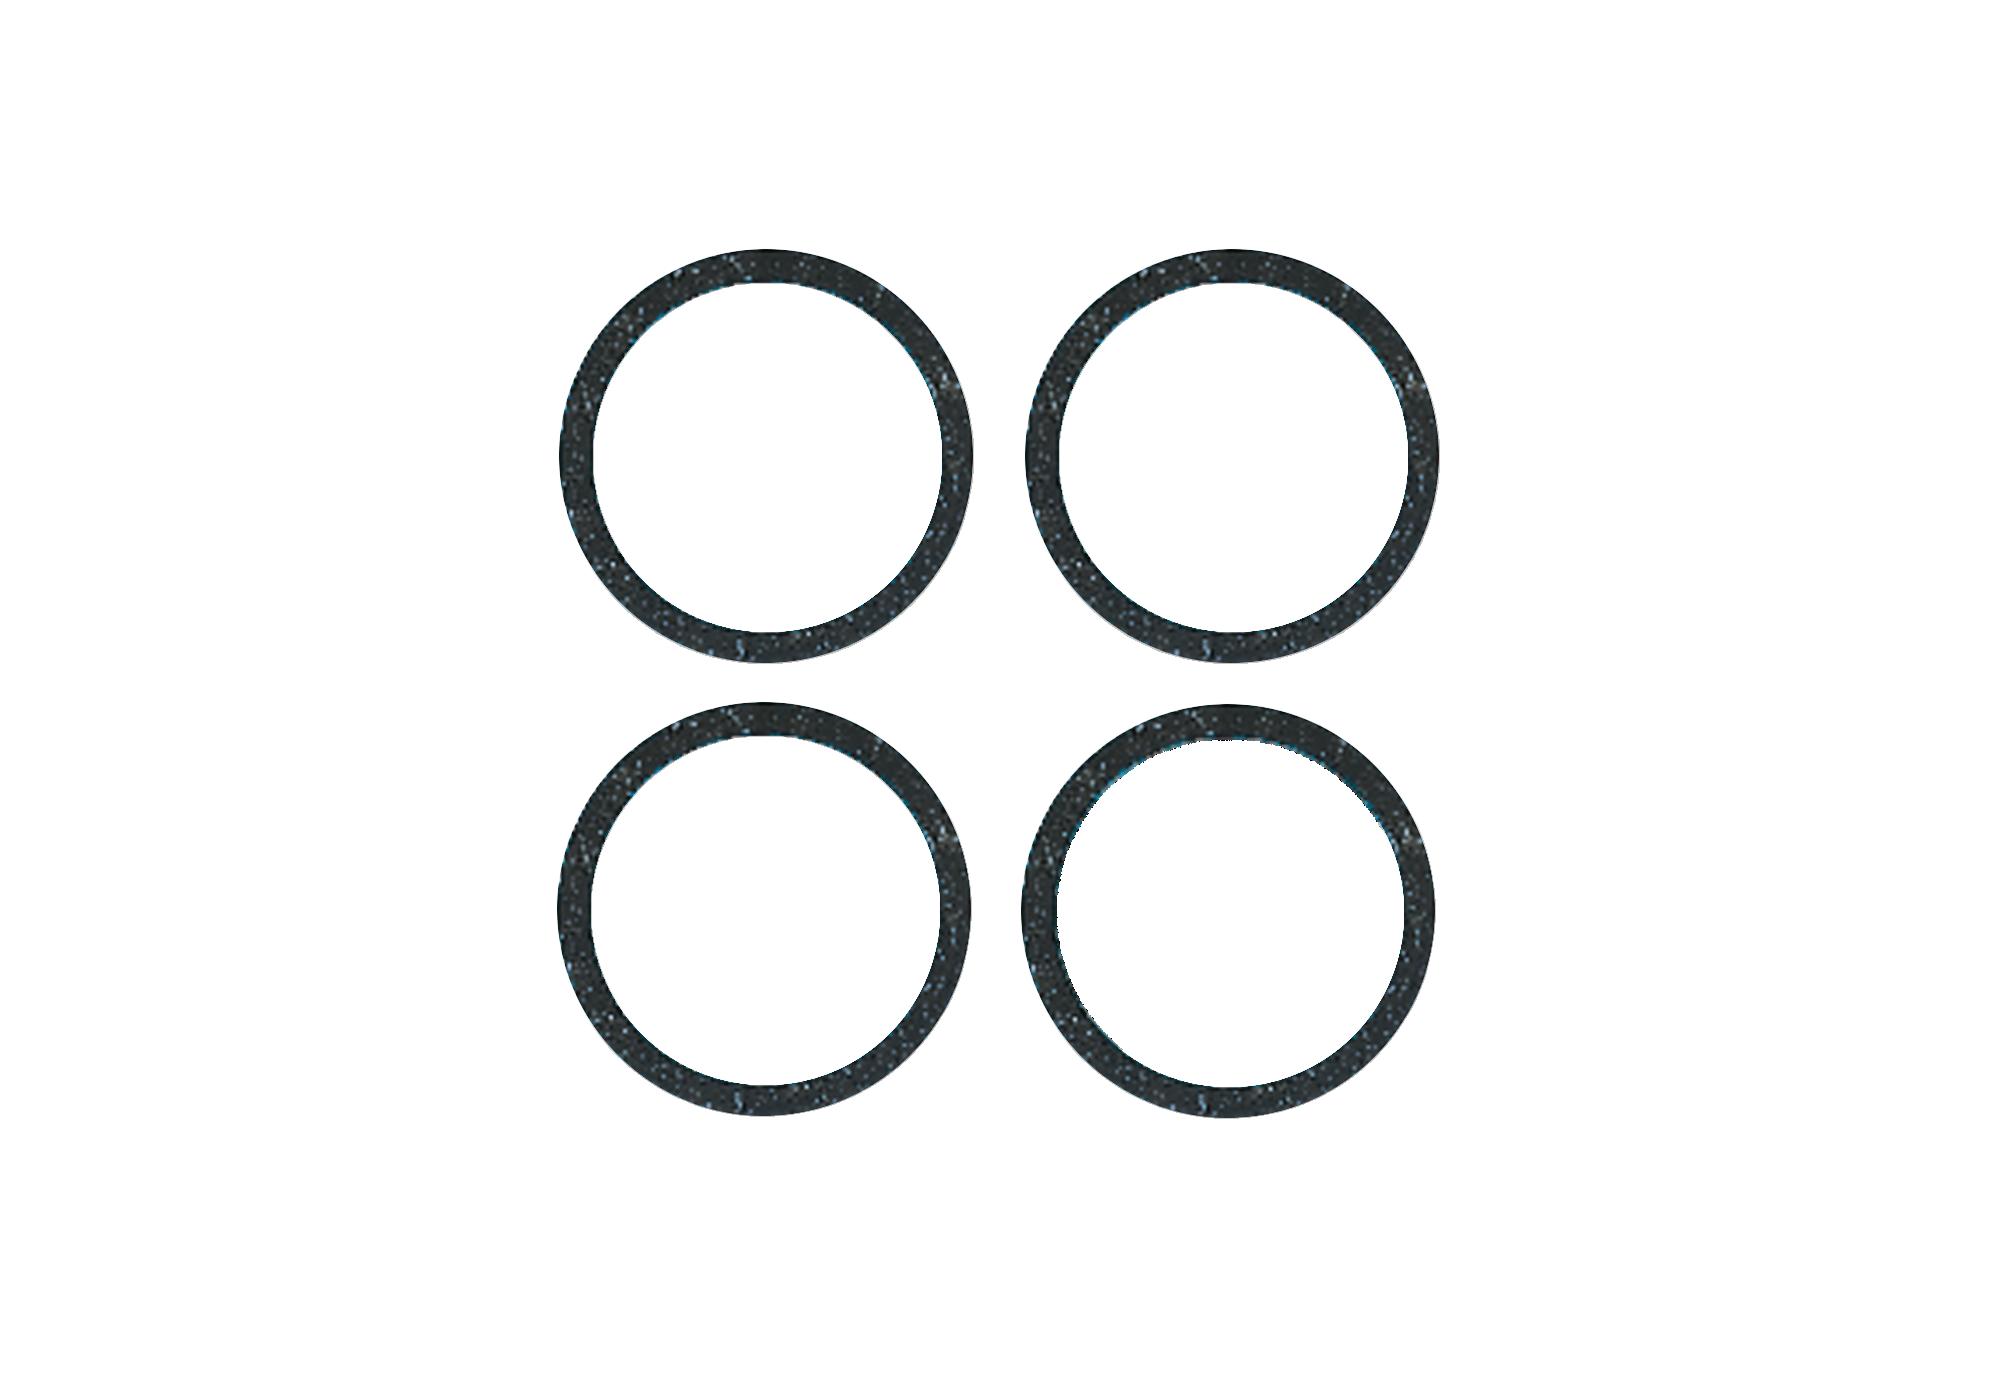 http://media.playmobil.com/i/playmobil/7231_product_detail/Anti-Skid Rings